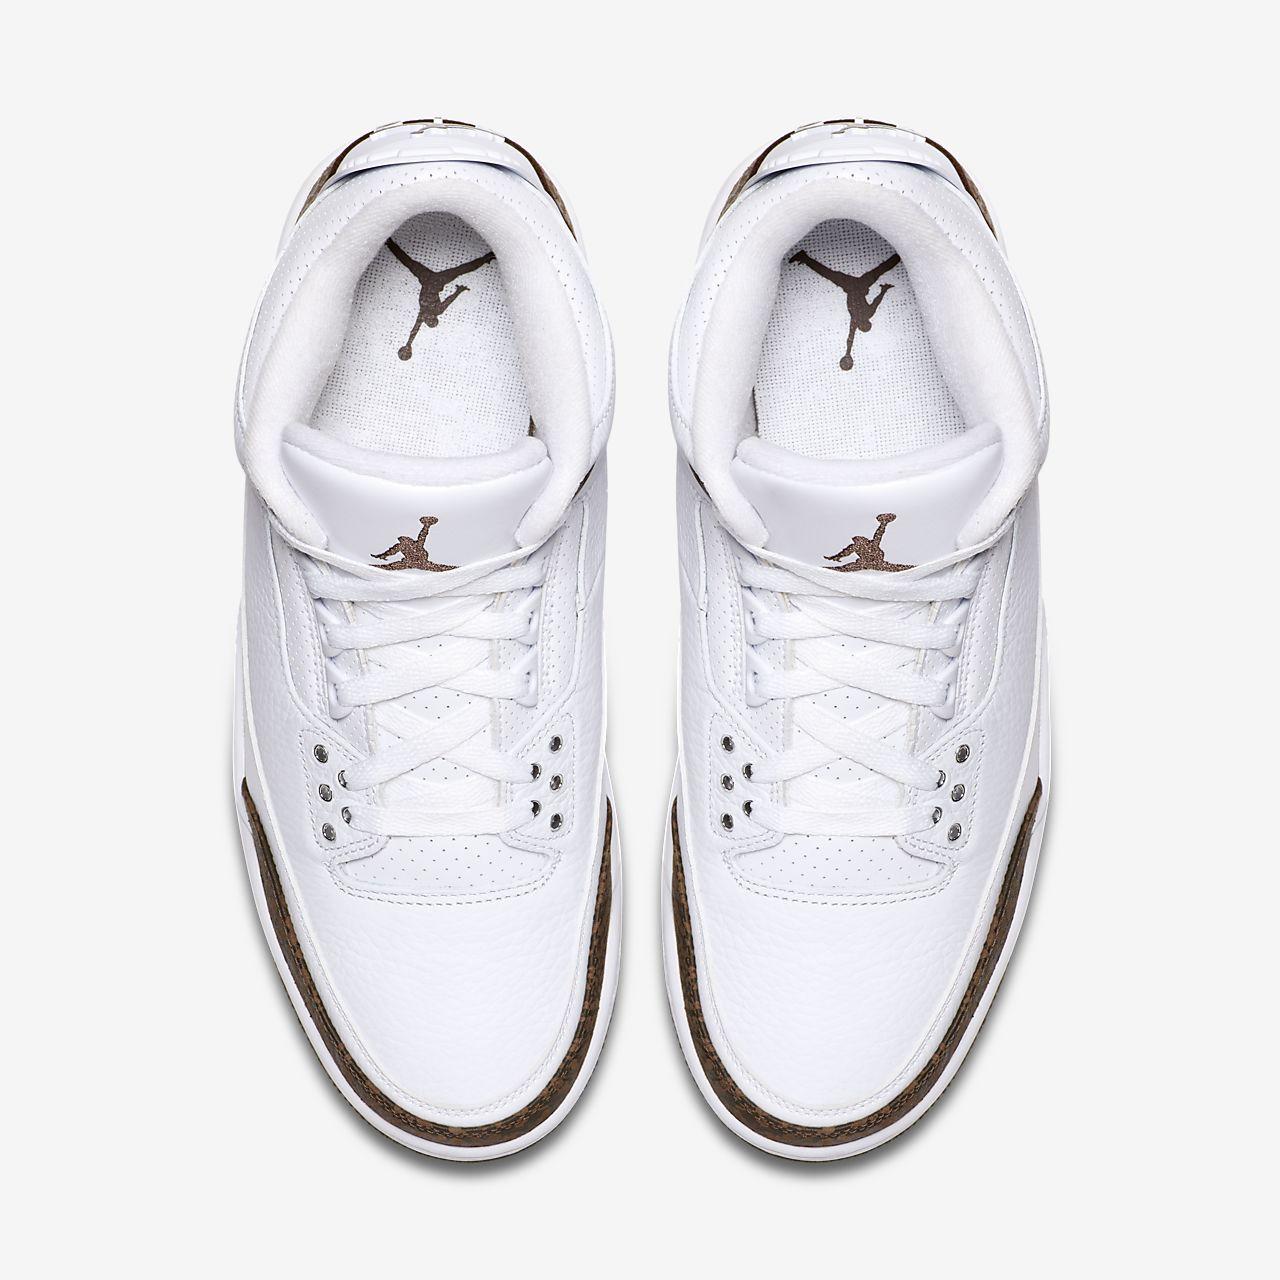 brand new 65872 b13f4 ... Air Jordan 3 Retro Men s Shoe